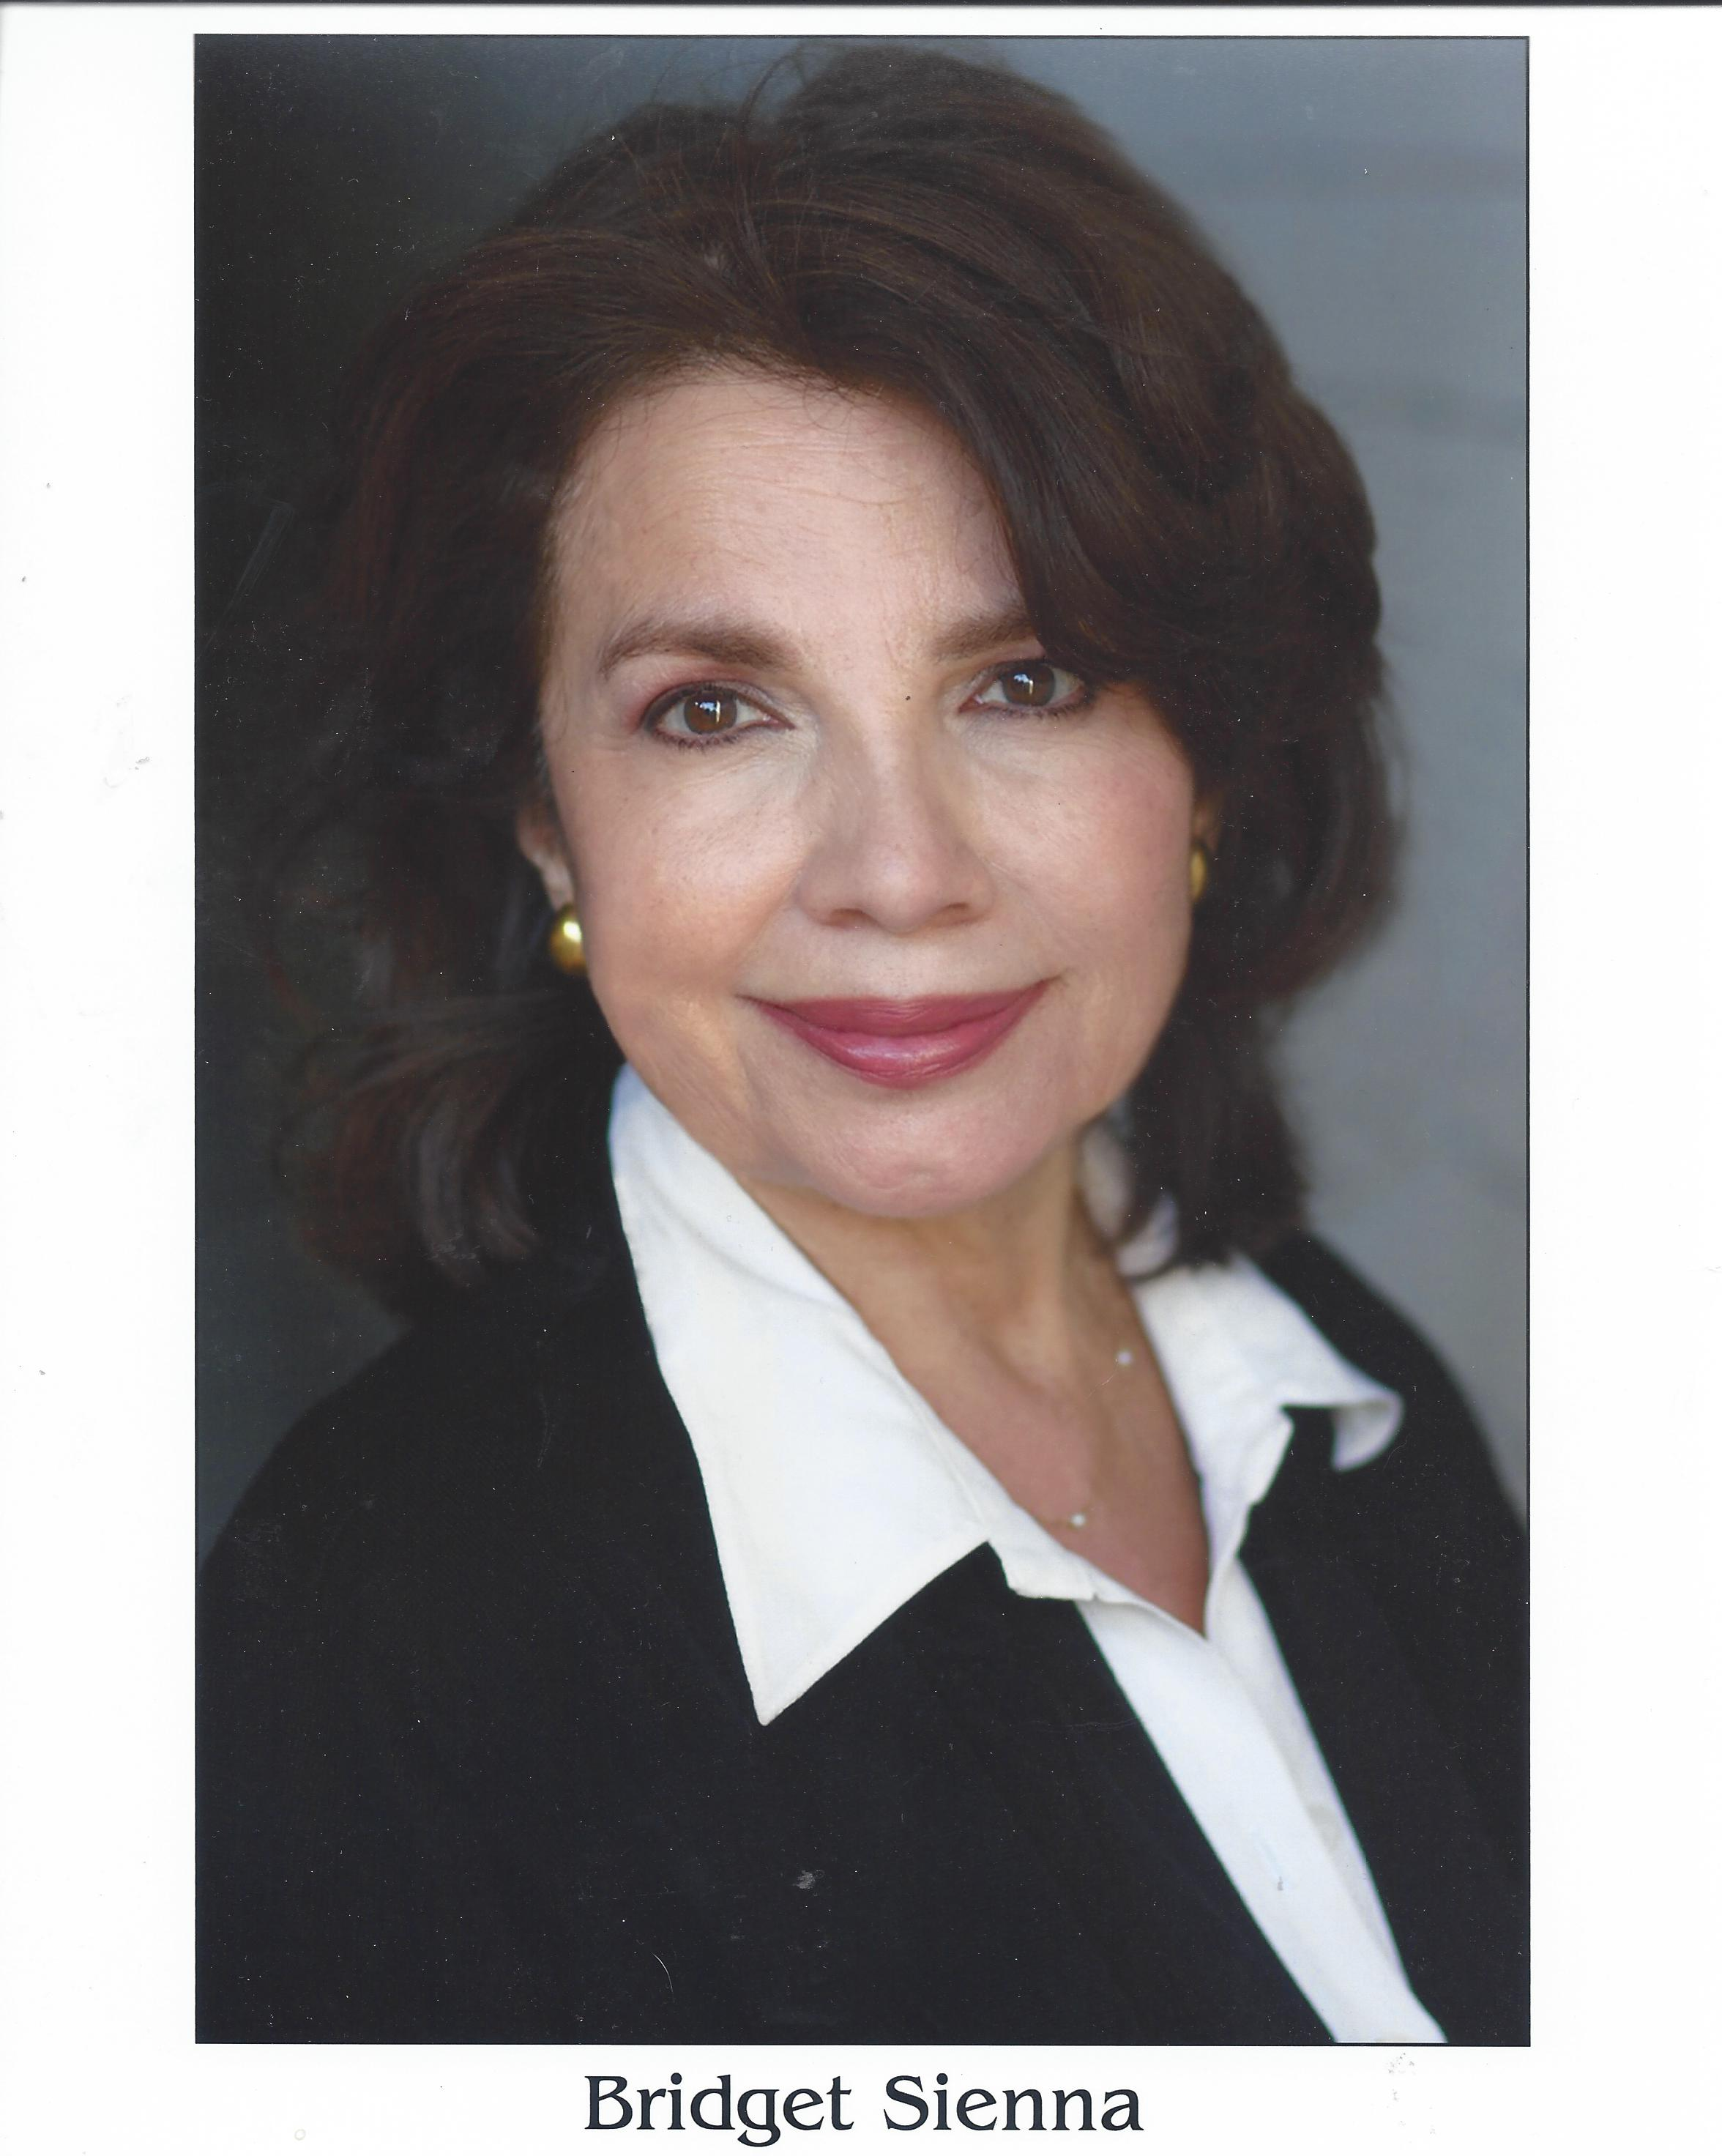 Bridget Sienna's primary photo